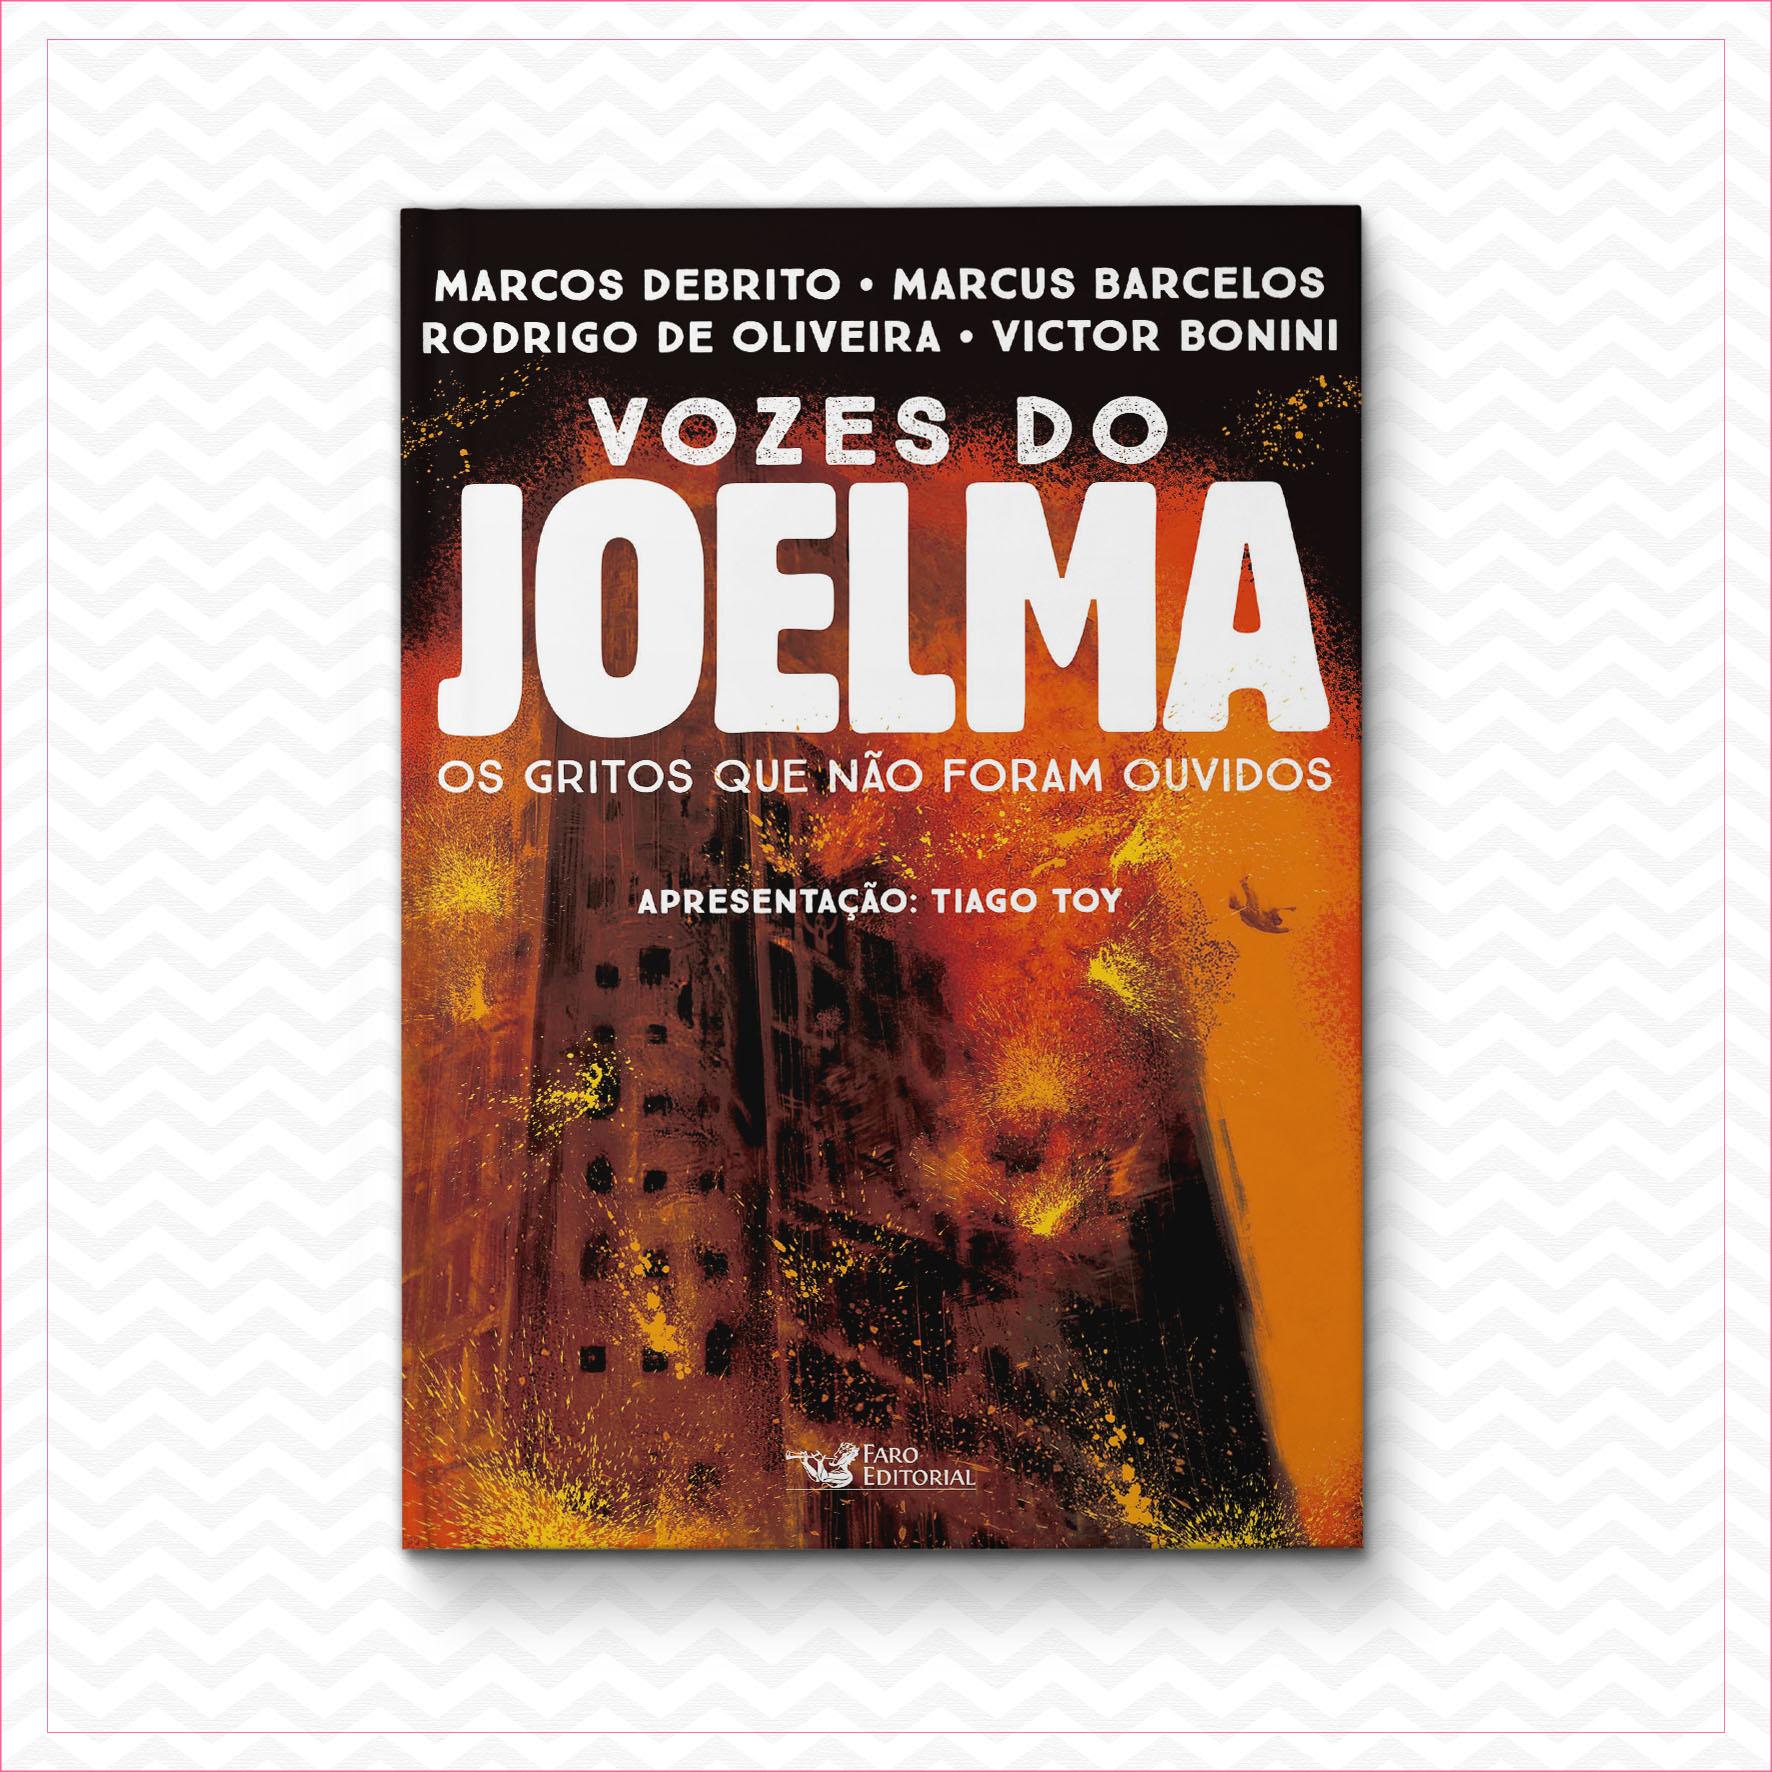 Vozes do Joelma – Marcos DeBrito, Rodrigo de Oliveira, Marcus Barcelos e Victor Bonini